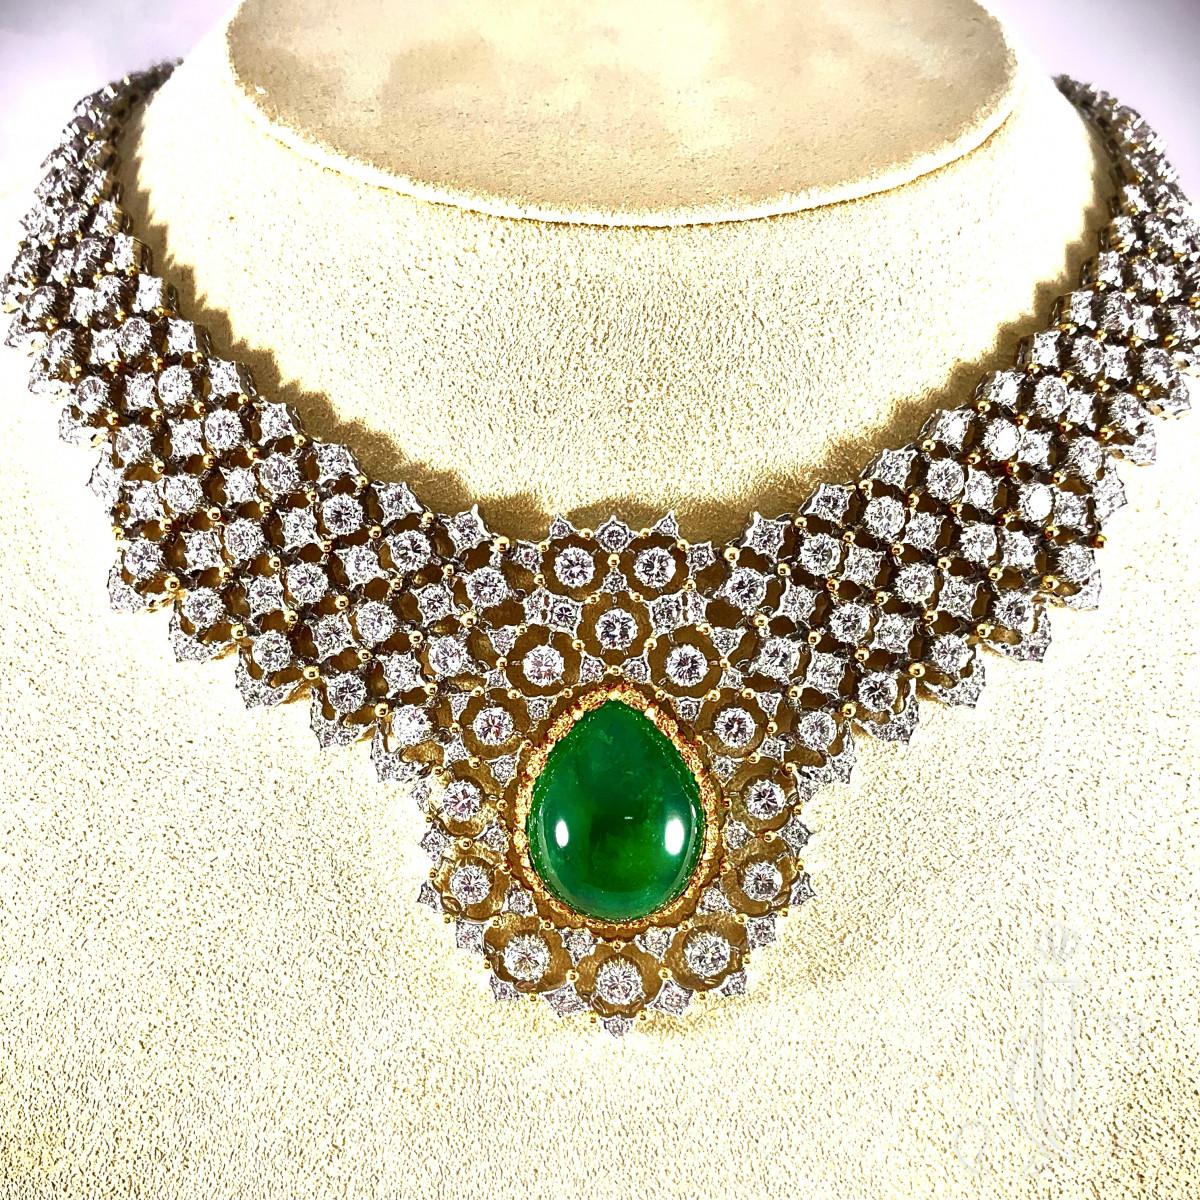 Gianmaria Buccellati Cabochon Emerald and Diamond Necklace